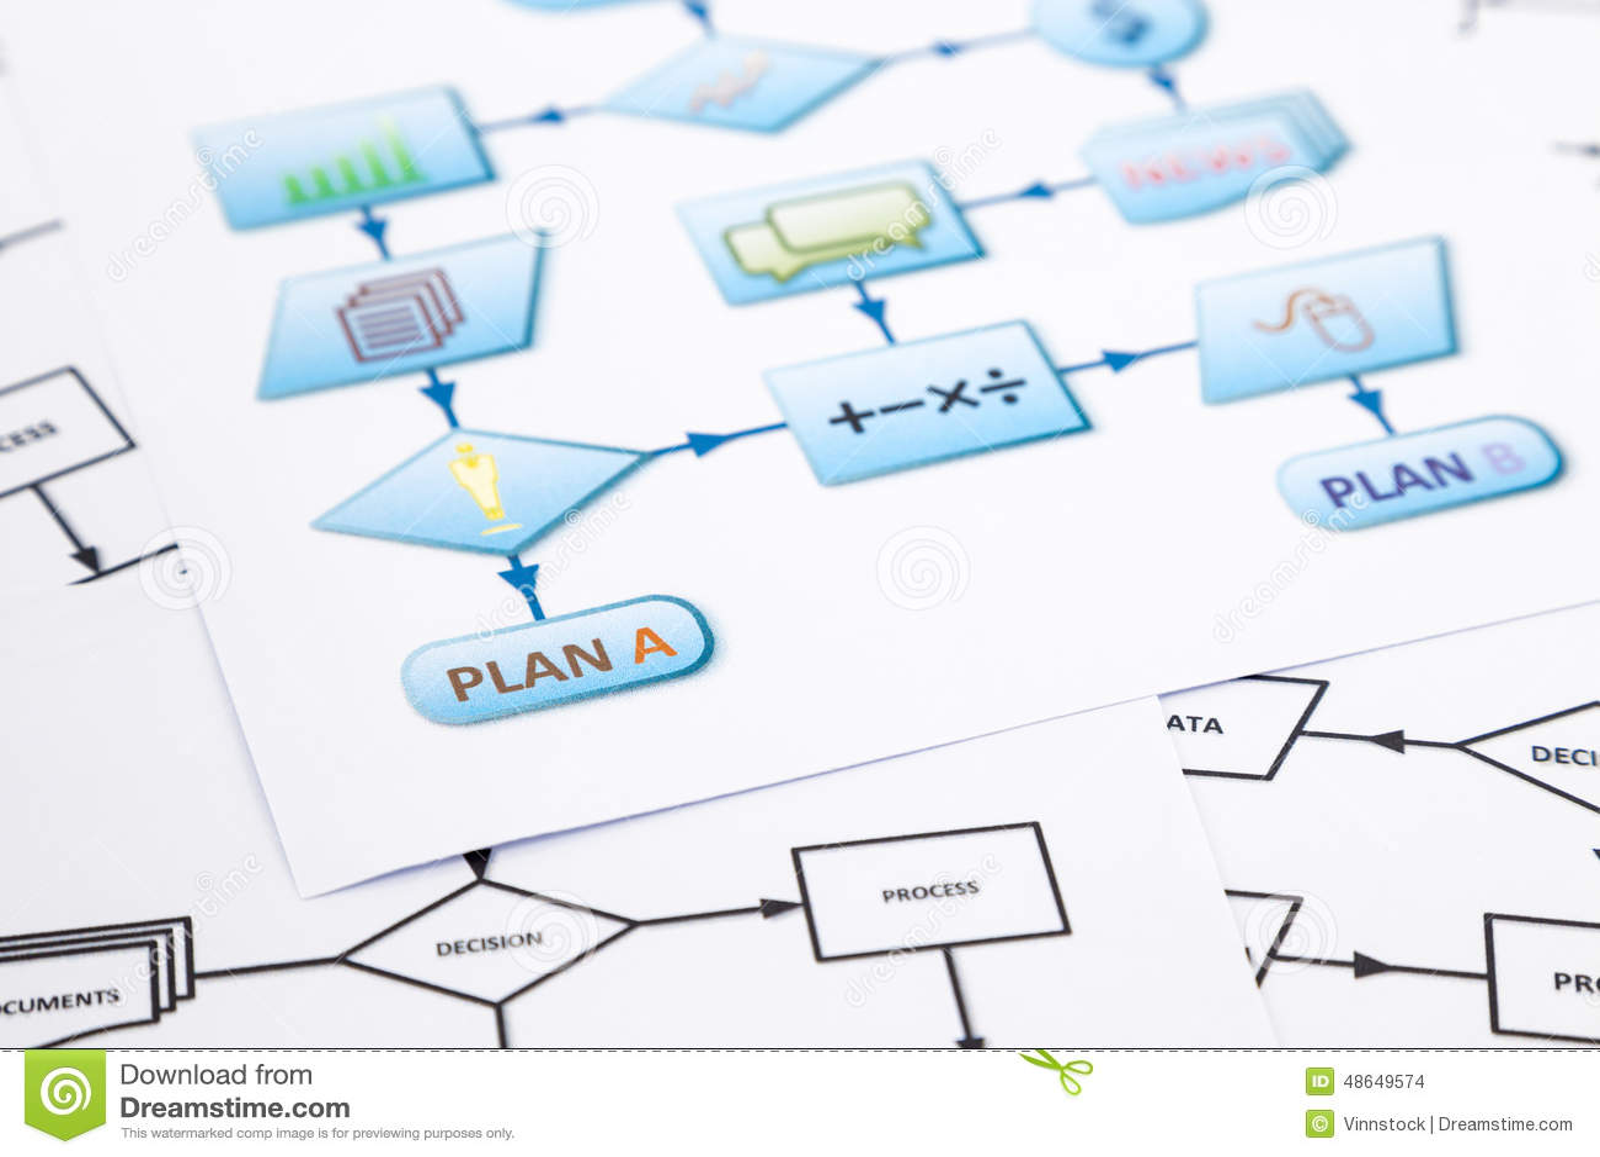 hight resolution of business plan process flow chart